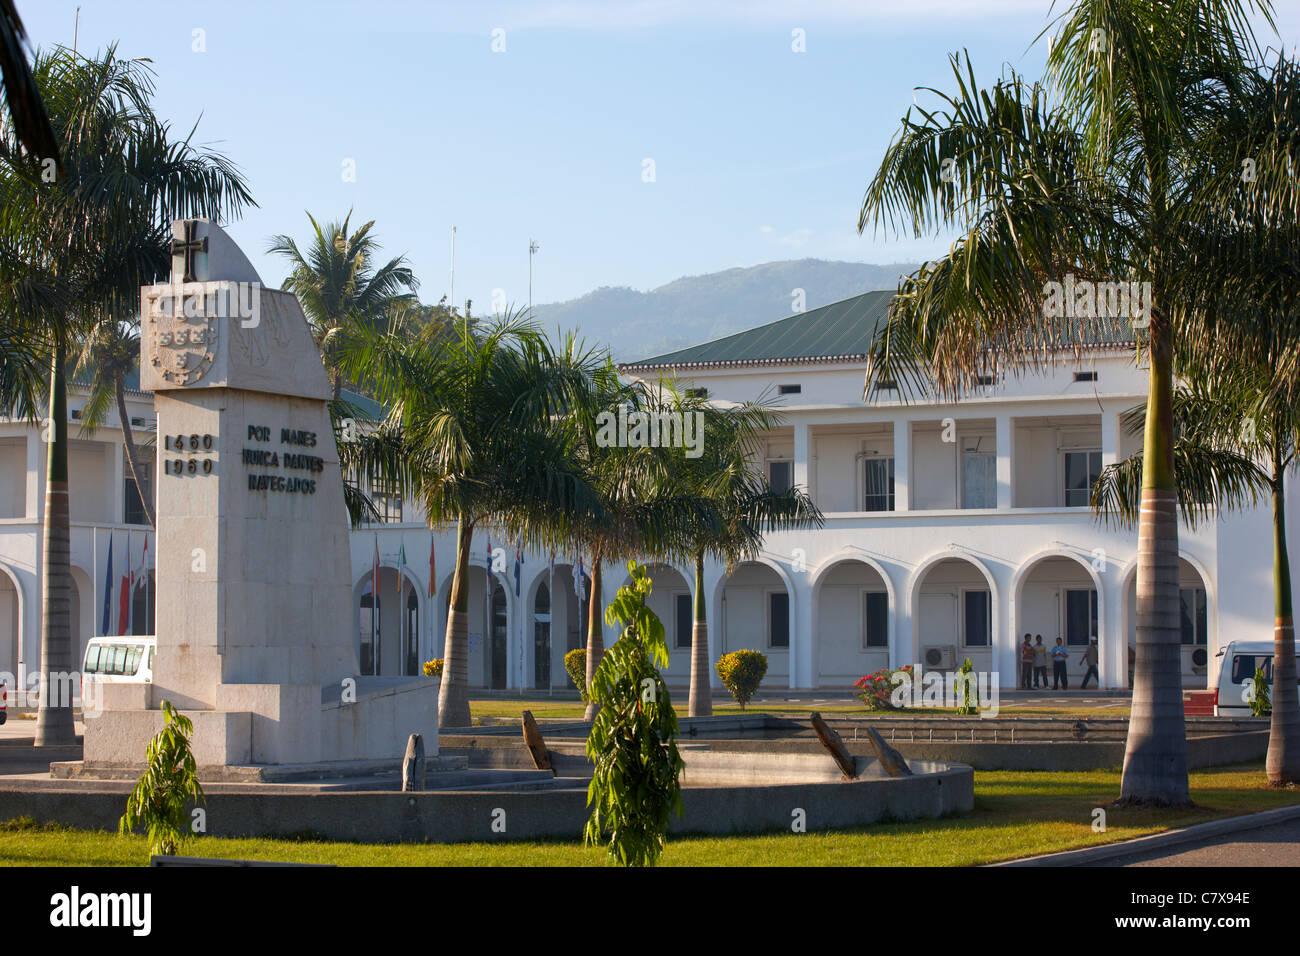 Palacio de Gobierno, Dili, Timor-Leste (East Timor), Asia Stock Photo